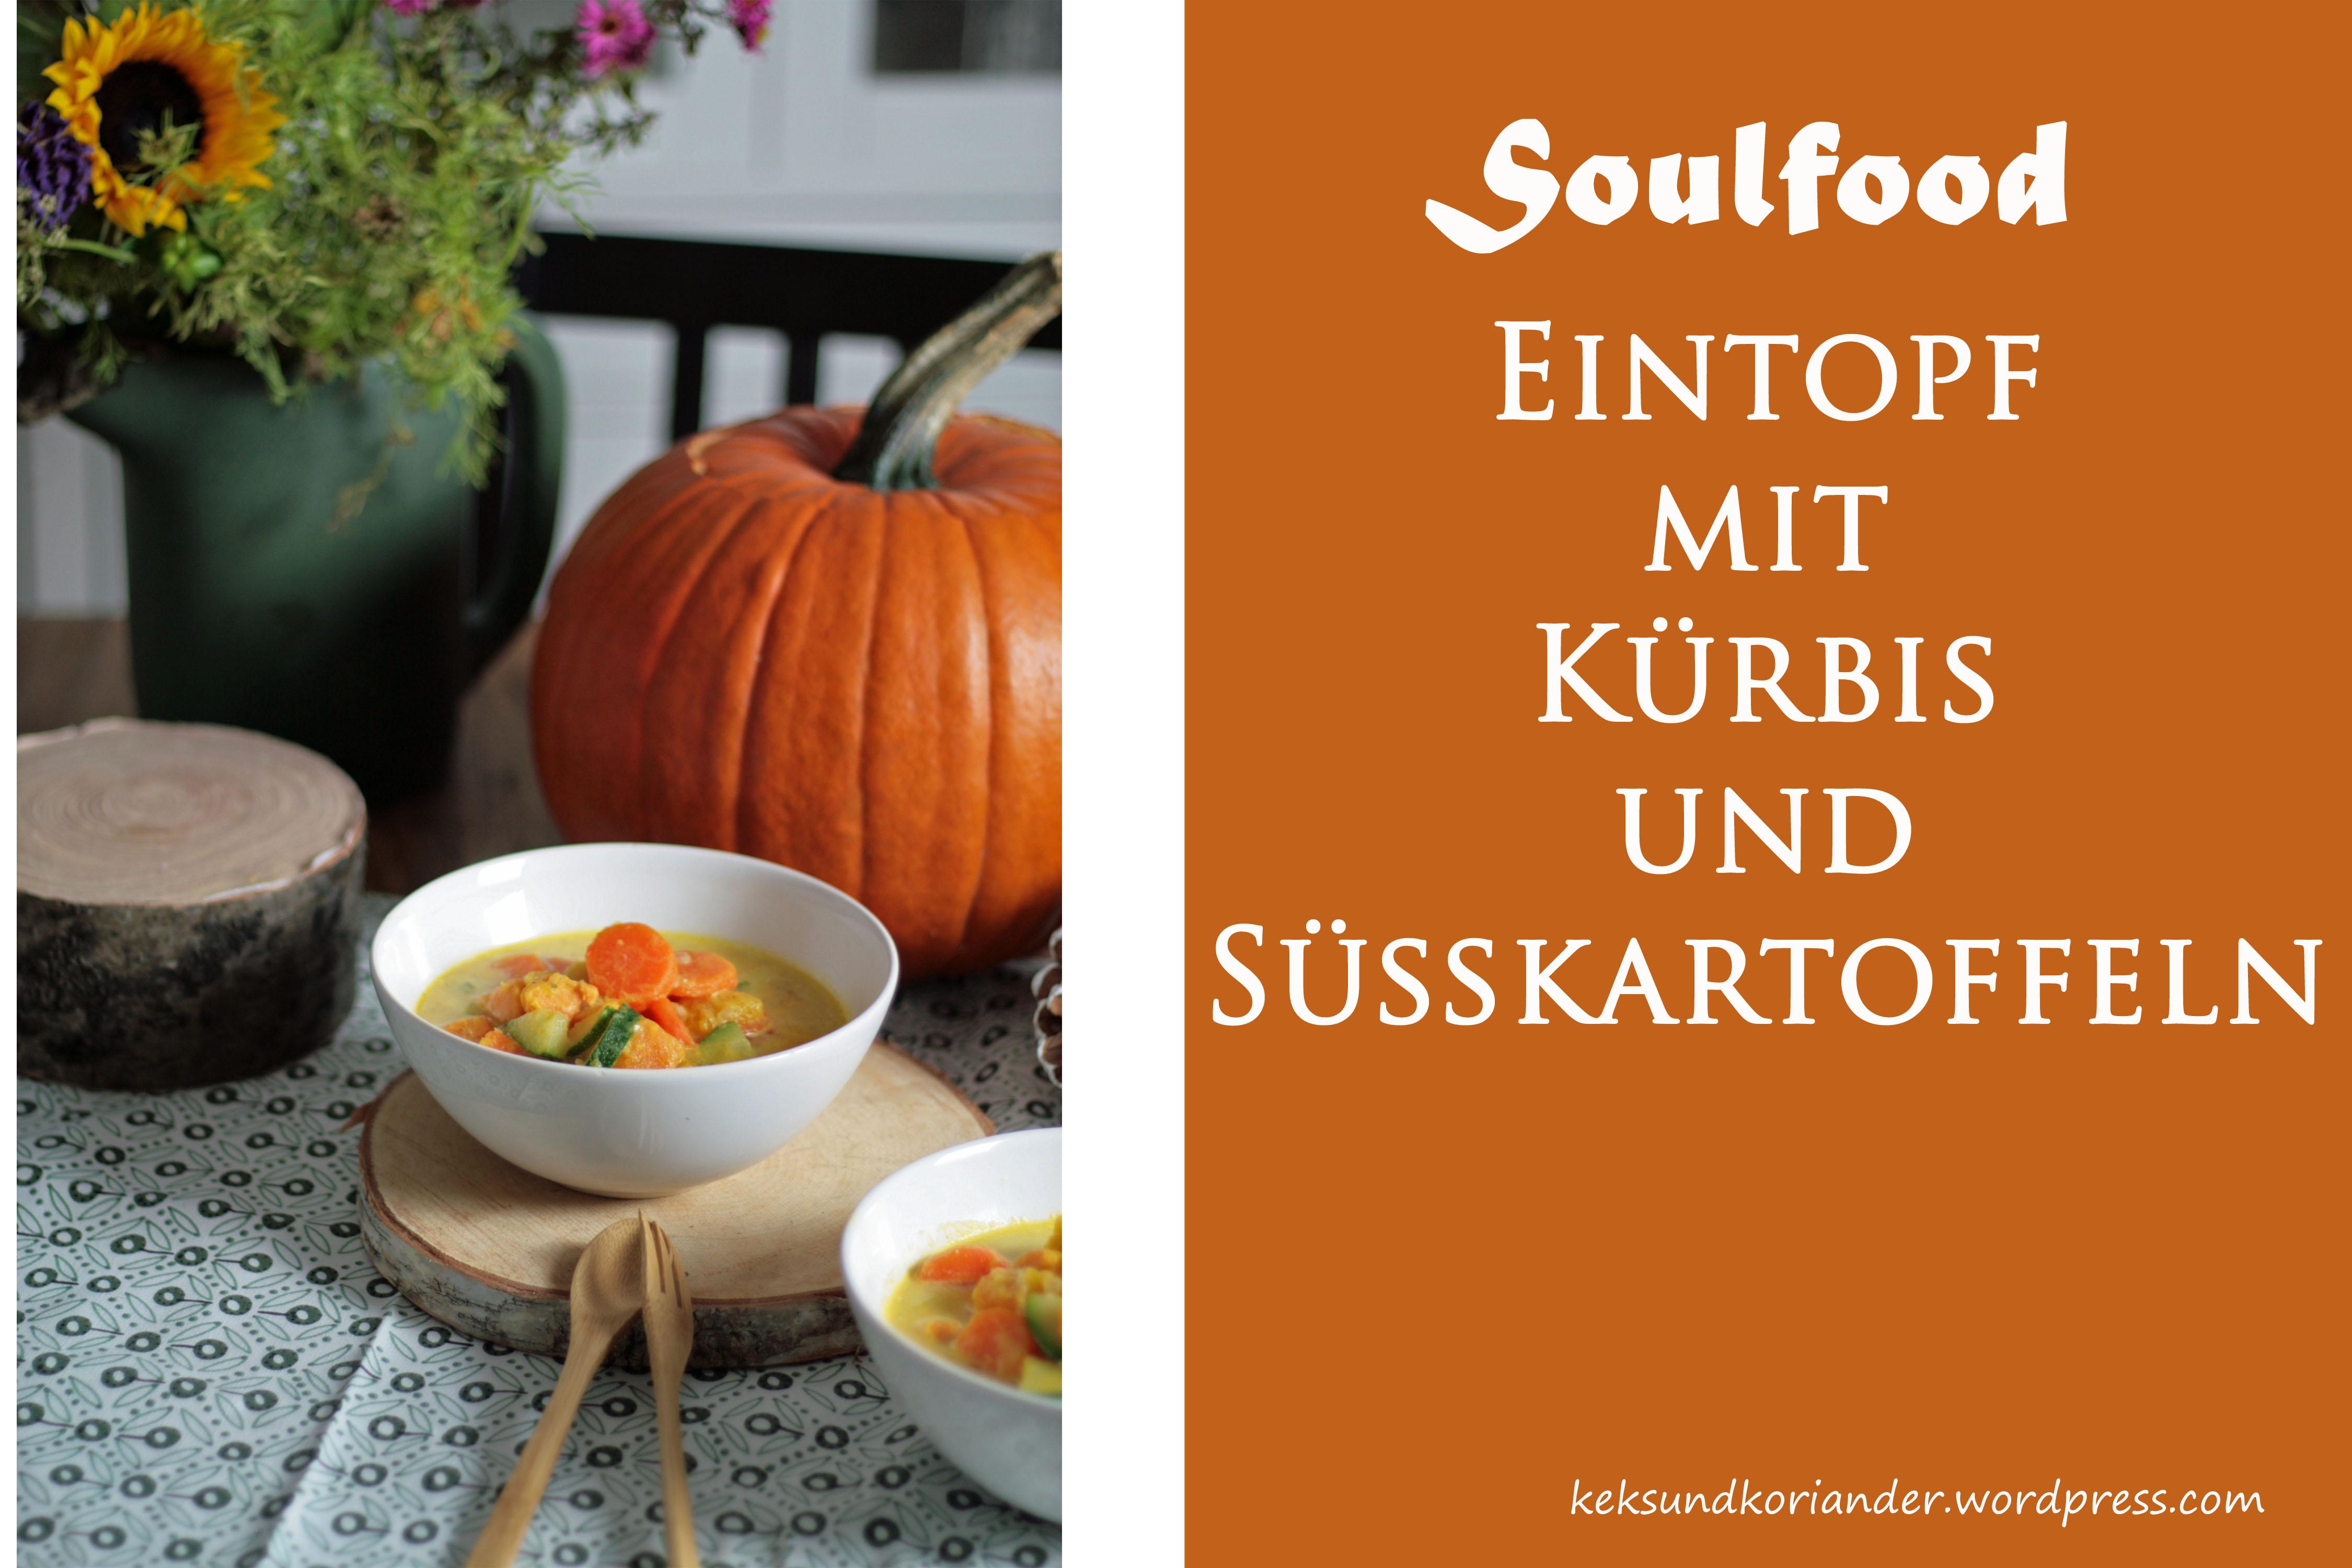 Kürbis-Süßkartoffel-Eintopf mit Curry2